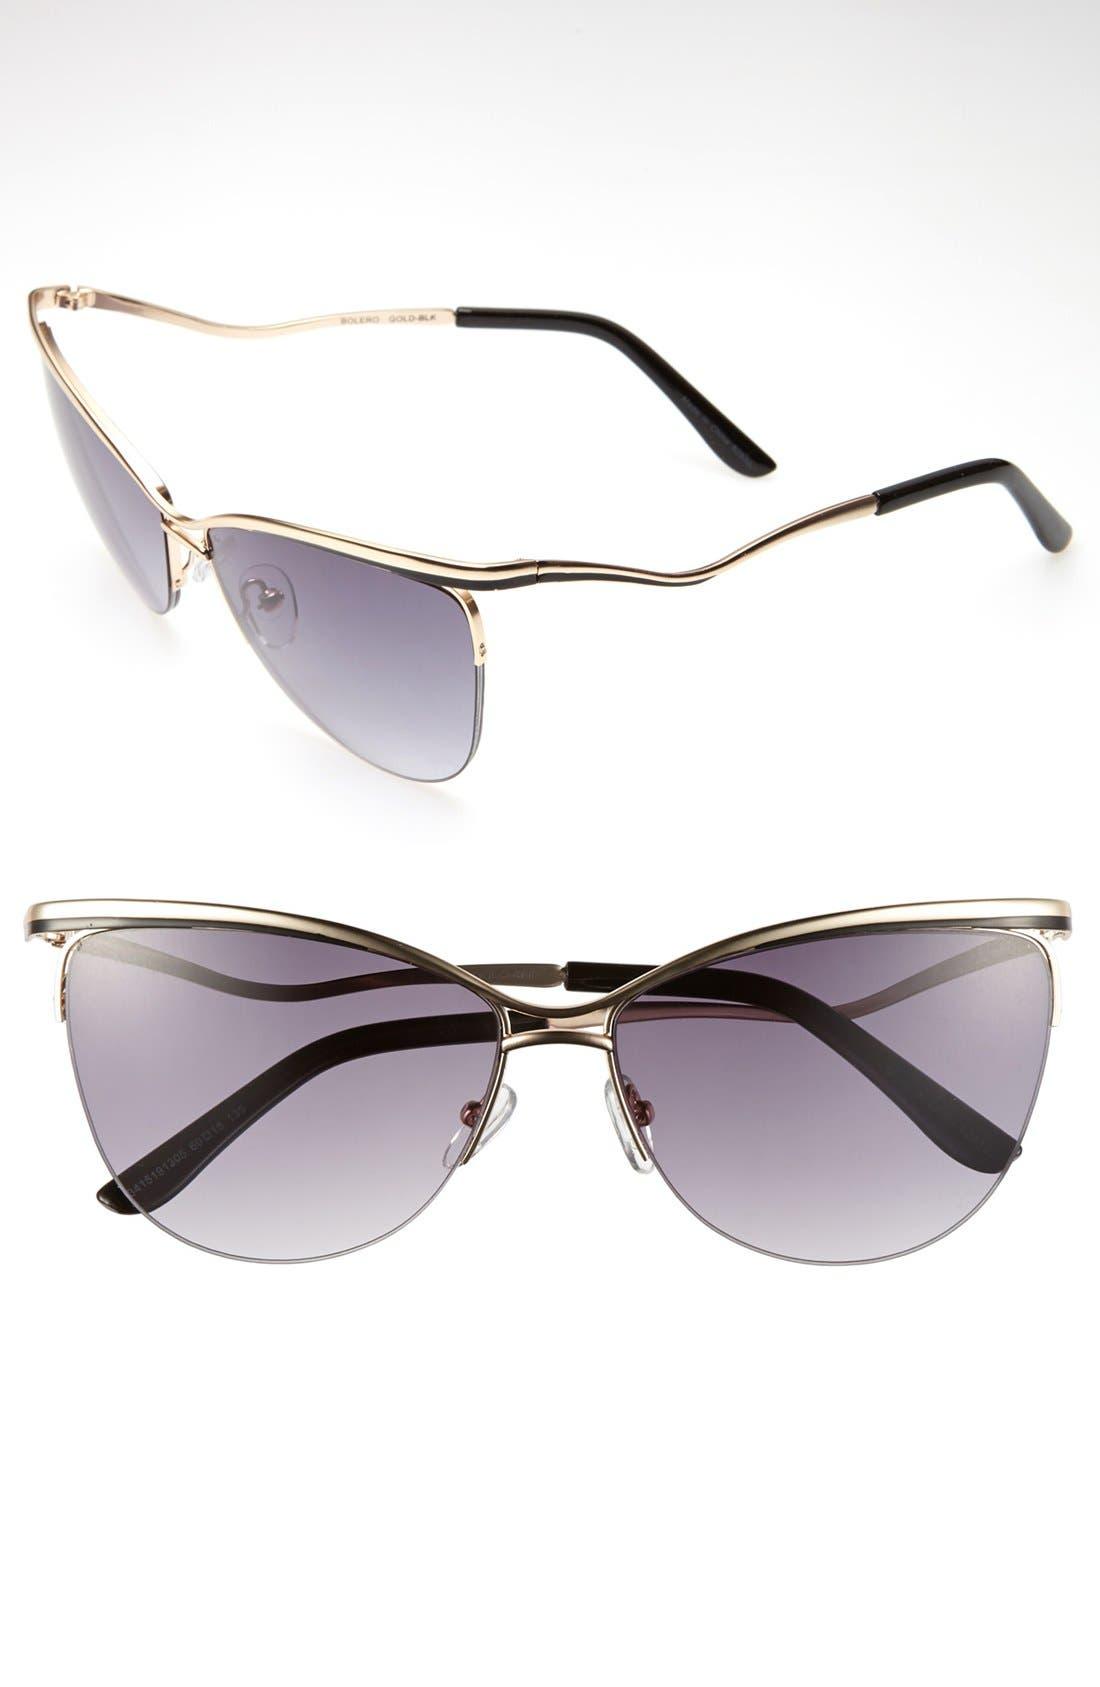 Main Image - Outlook Eyewear 'Bolero' 60mm Sunglasses